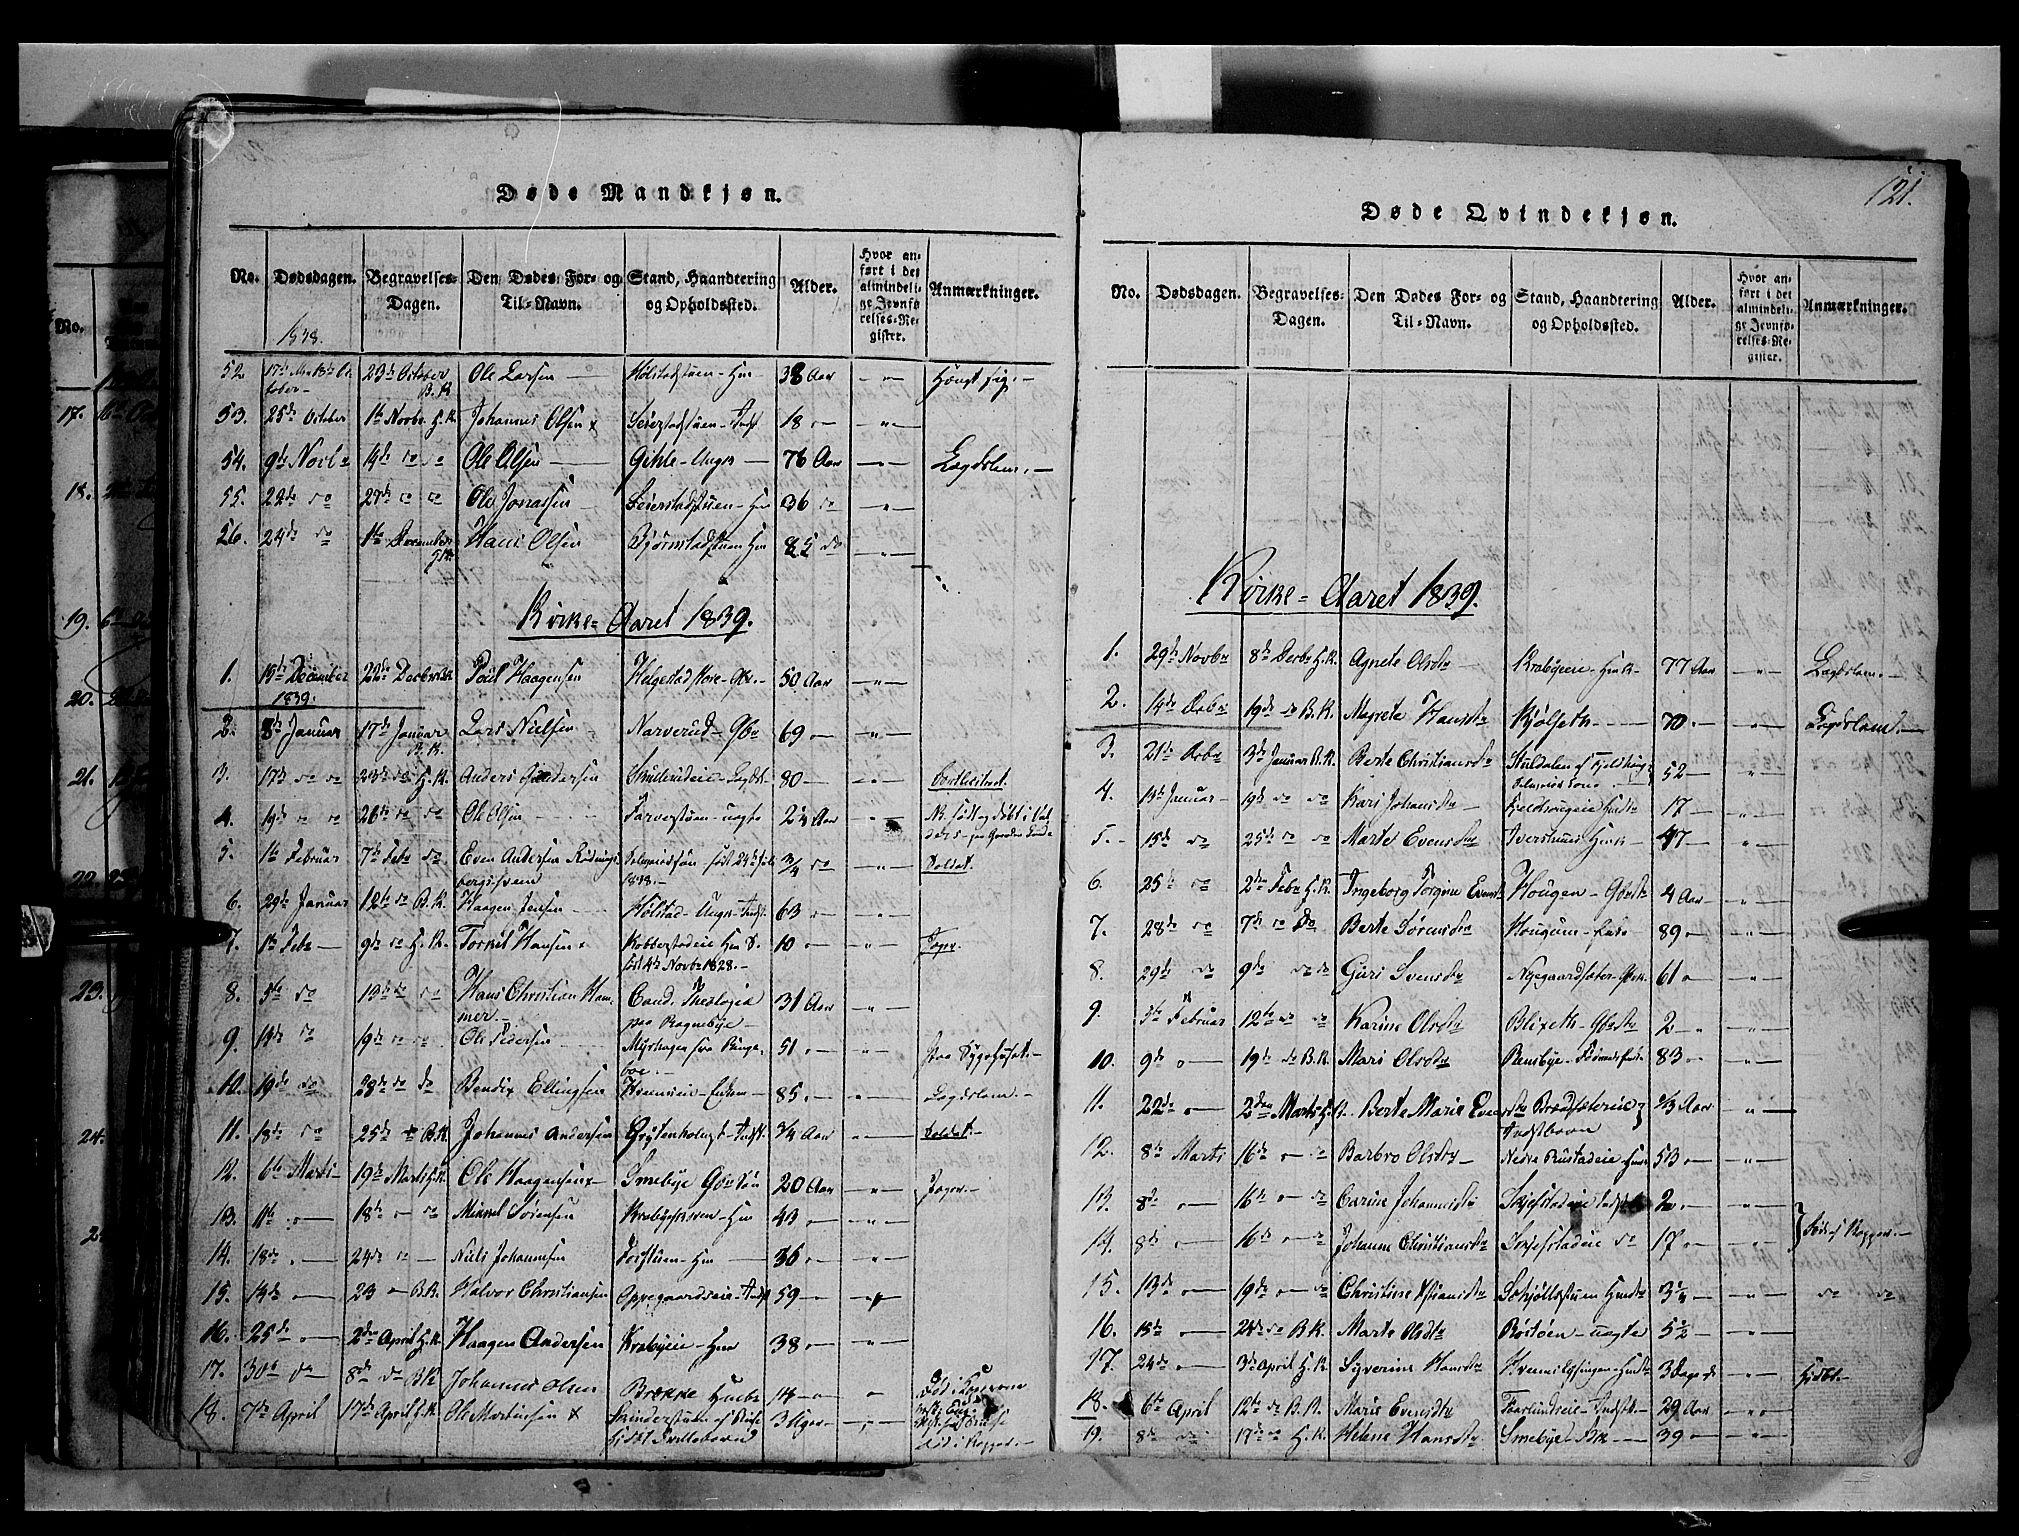 SAH, Østre Toten prestekontor, Ministerialbok nr. 1, 1828-1839, s. 121